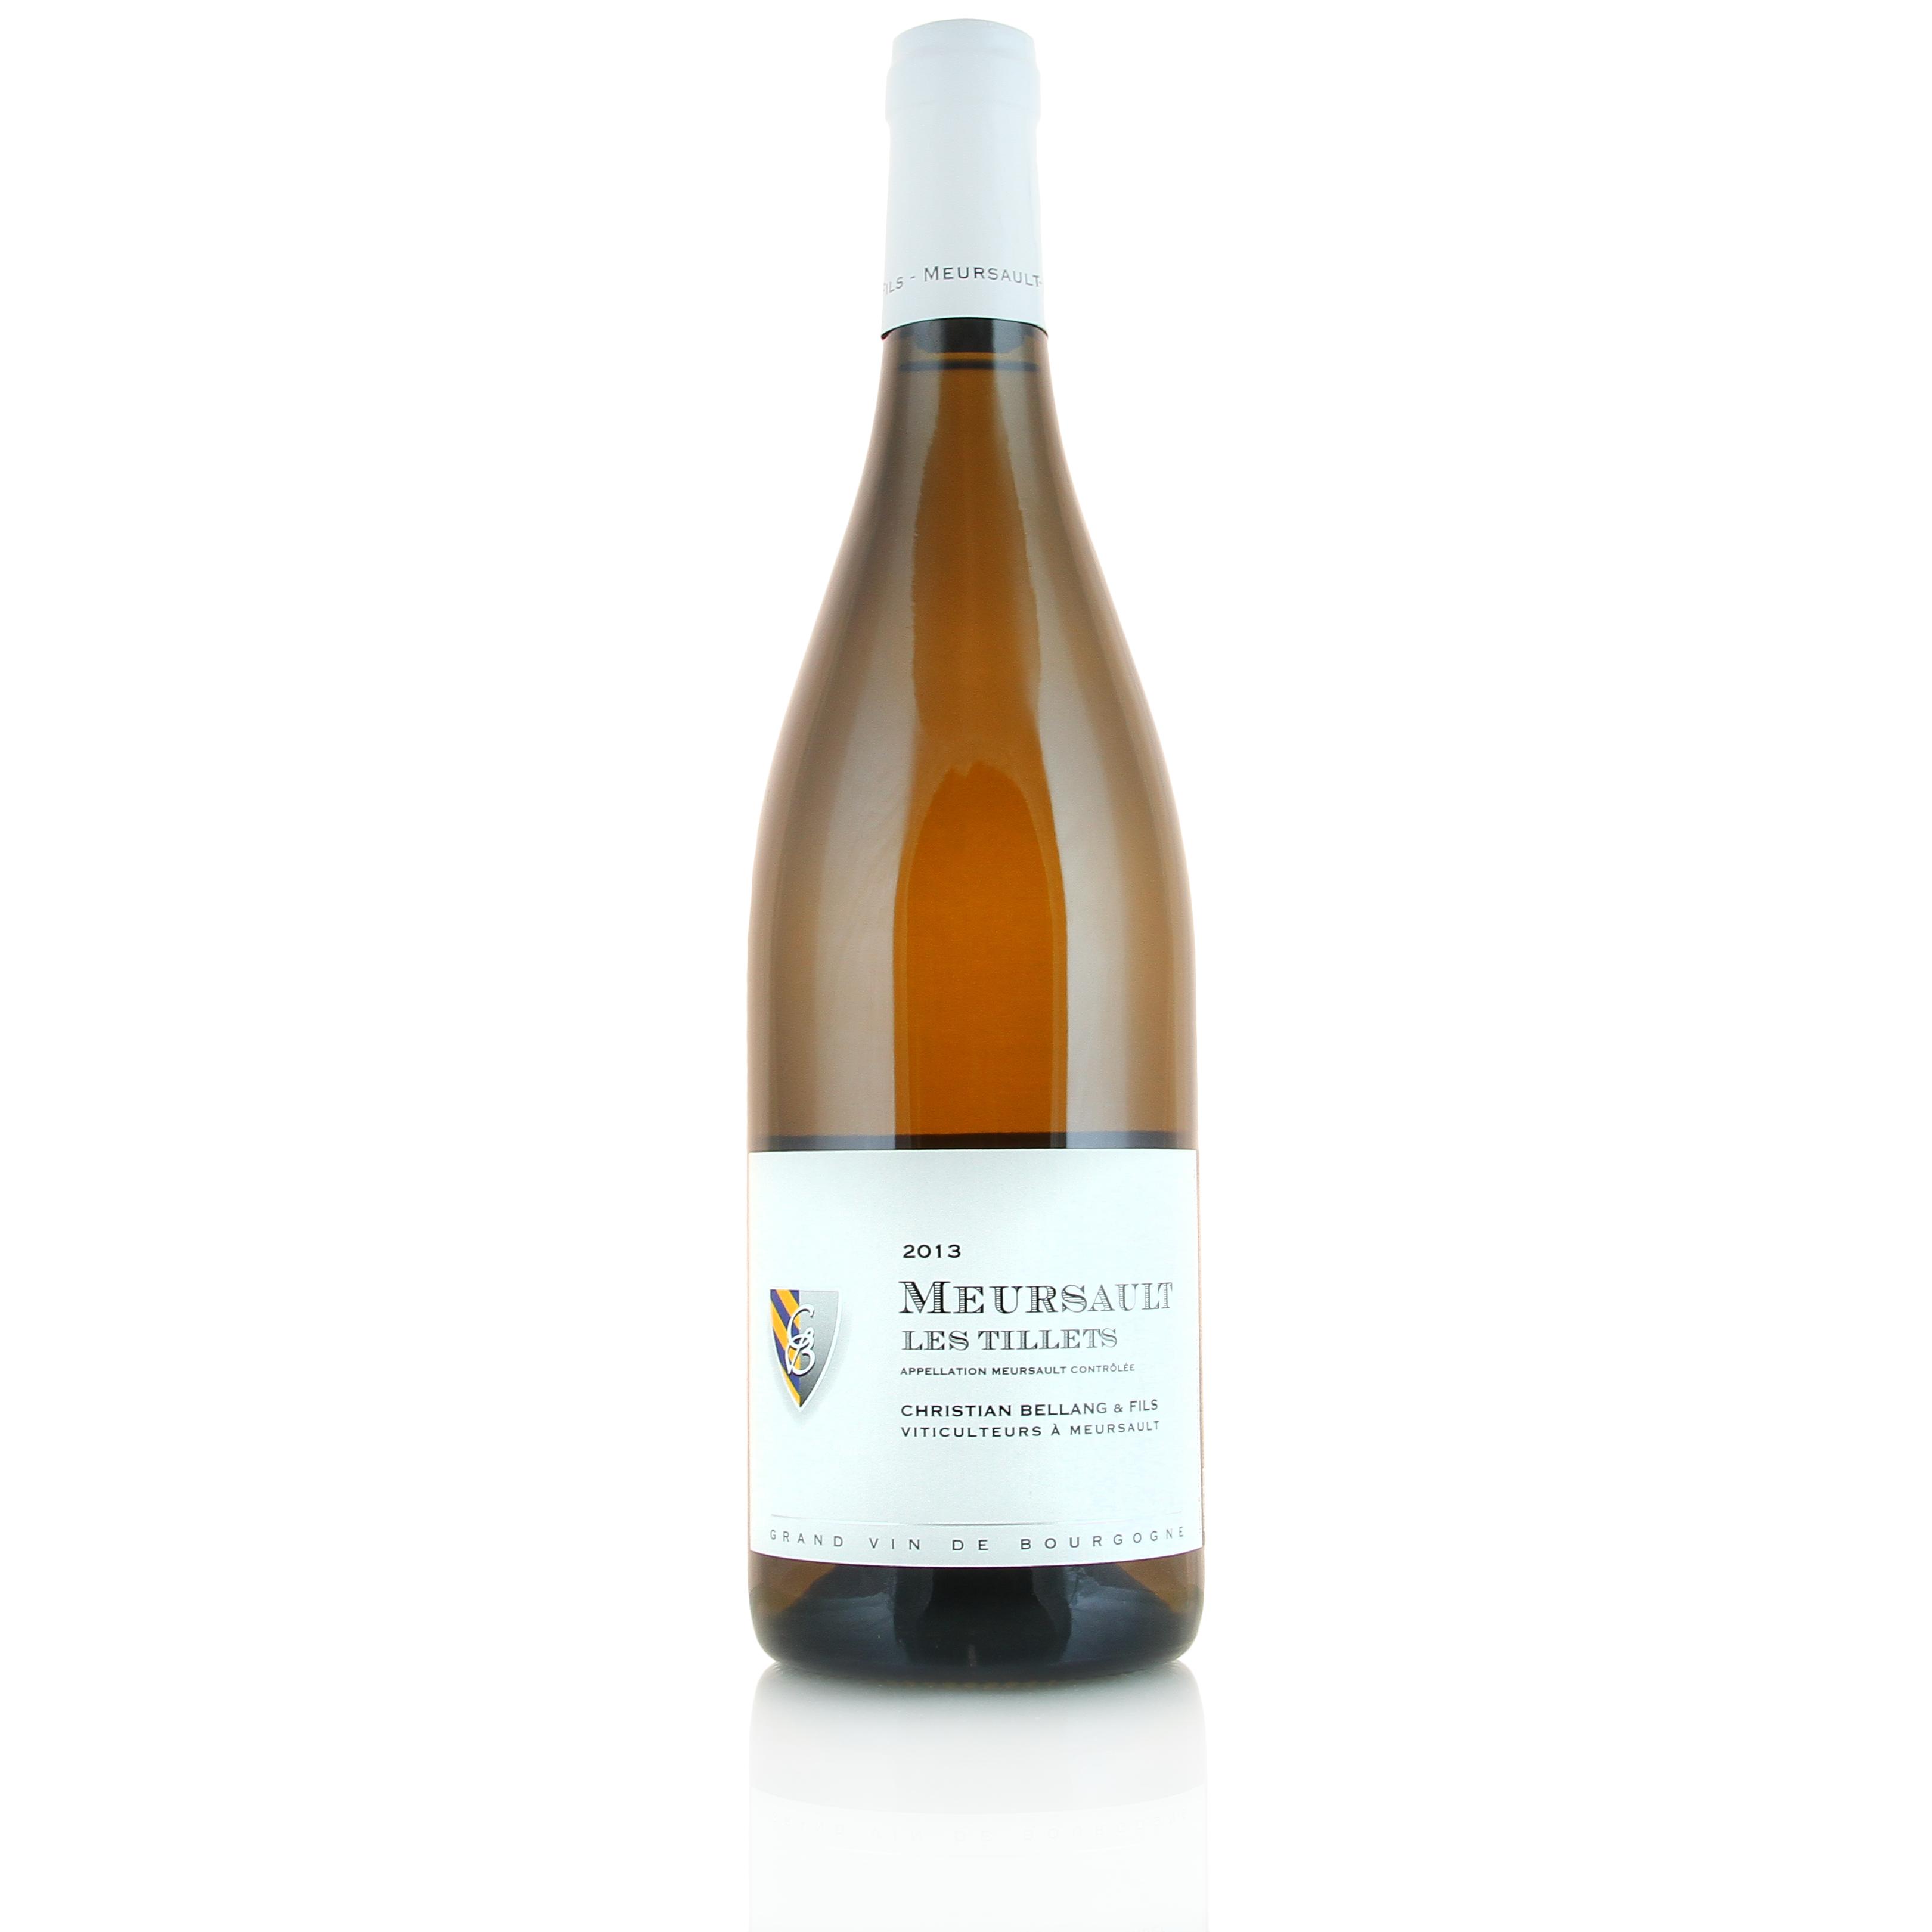 Meursault Les Tillets, 2013. Domaine Christian Bellang & Fils